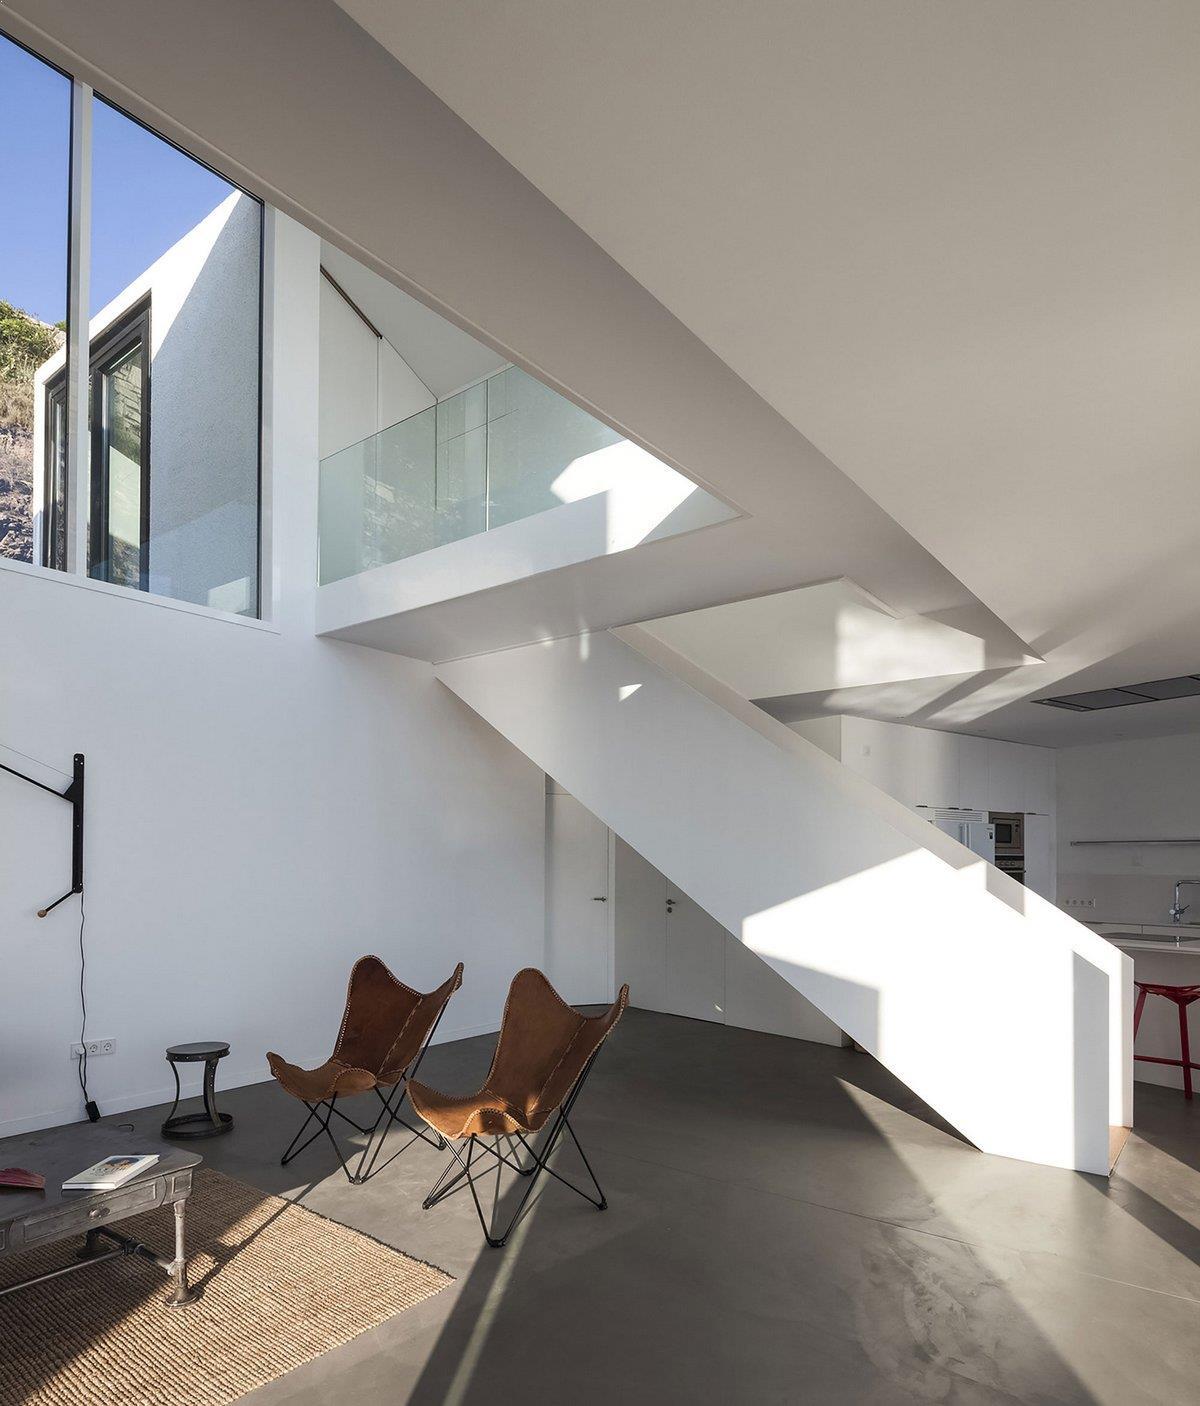 Casa_cubica_scara_metalica_moderna